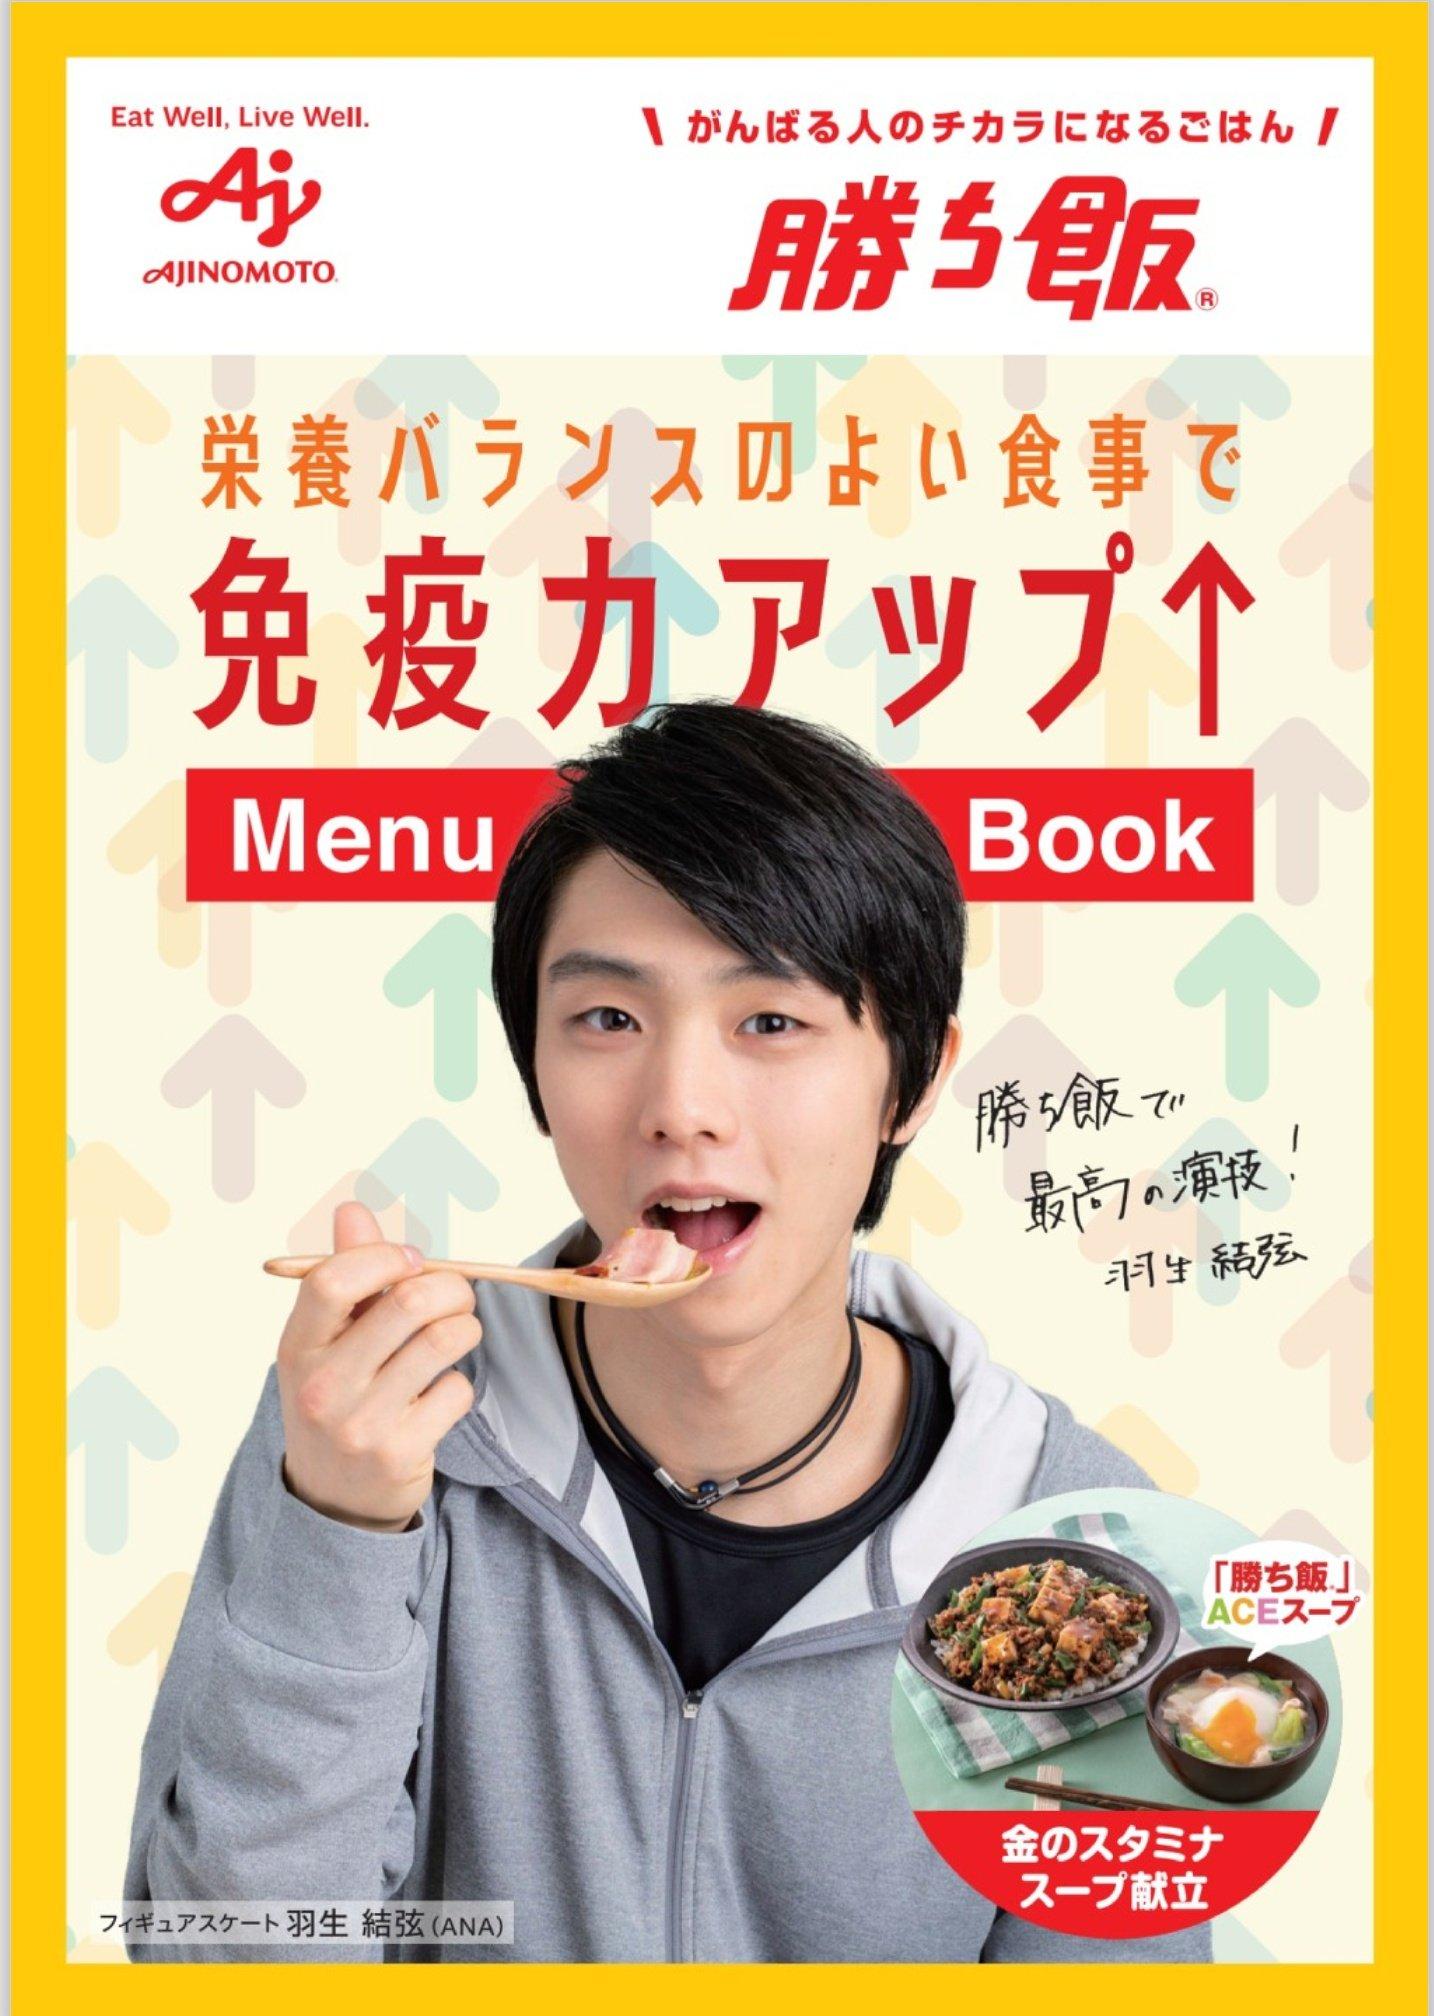 YuzuNews dal 11 al 20 ottobre Ajinomoto Yuzuru Hanyu menu food Japan